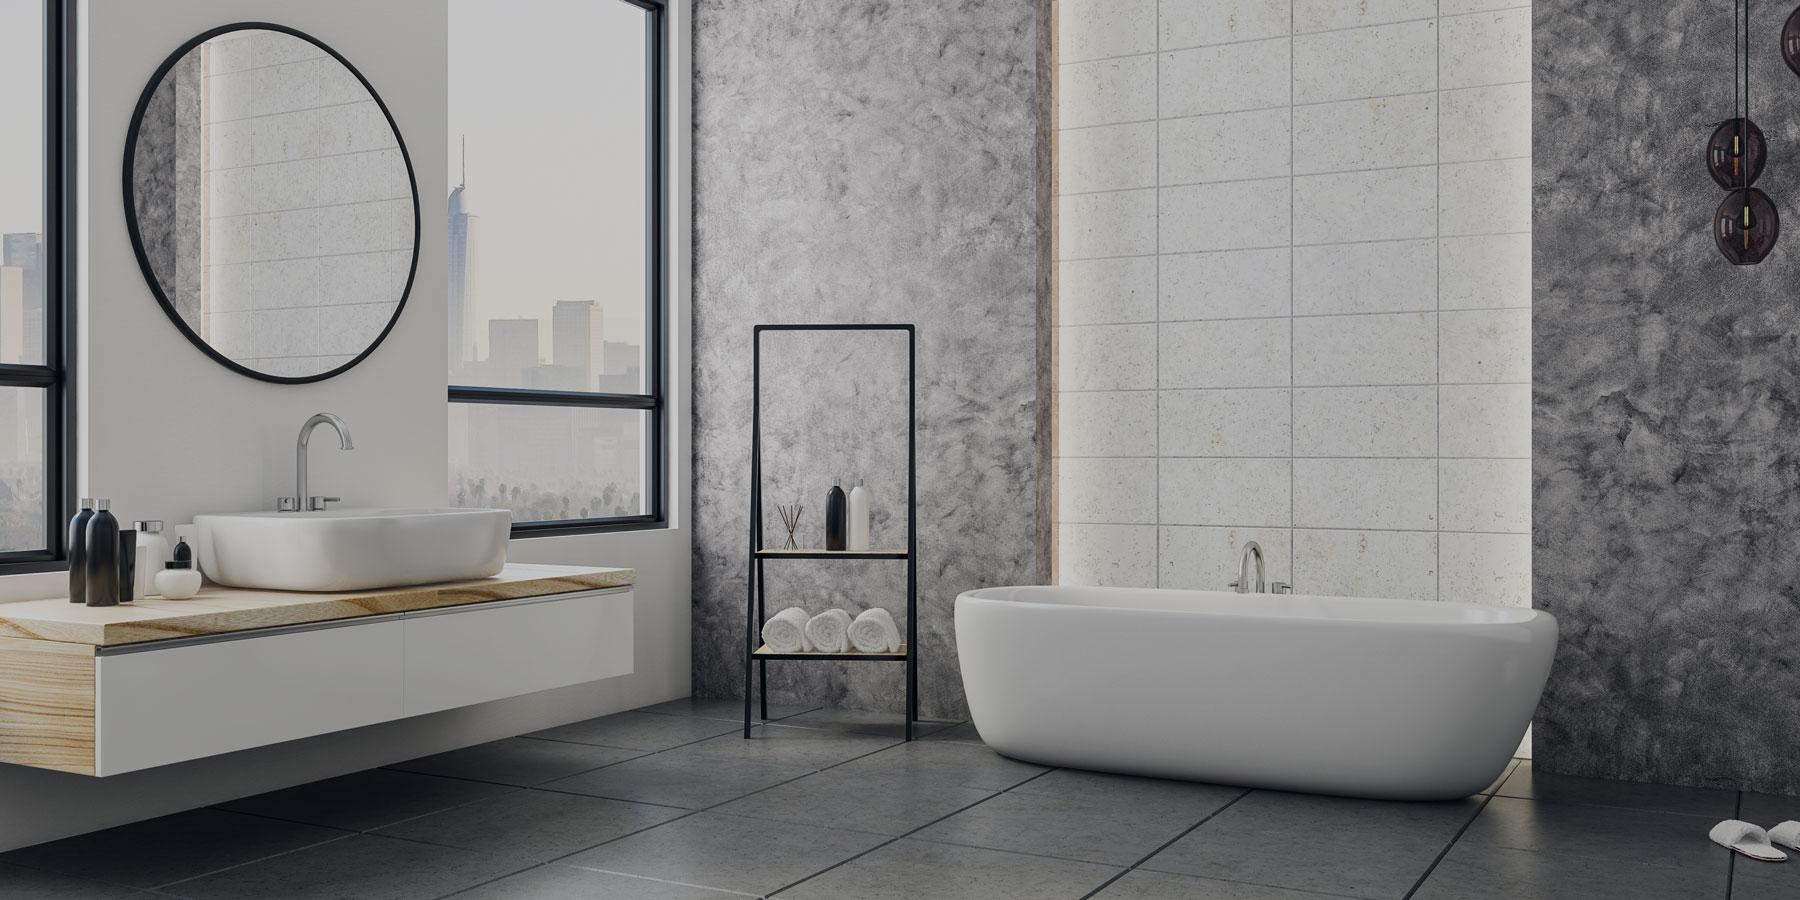 Waterflo Store Gallery | Bathroom Fixtures Toronto